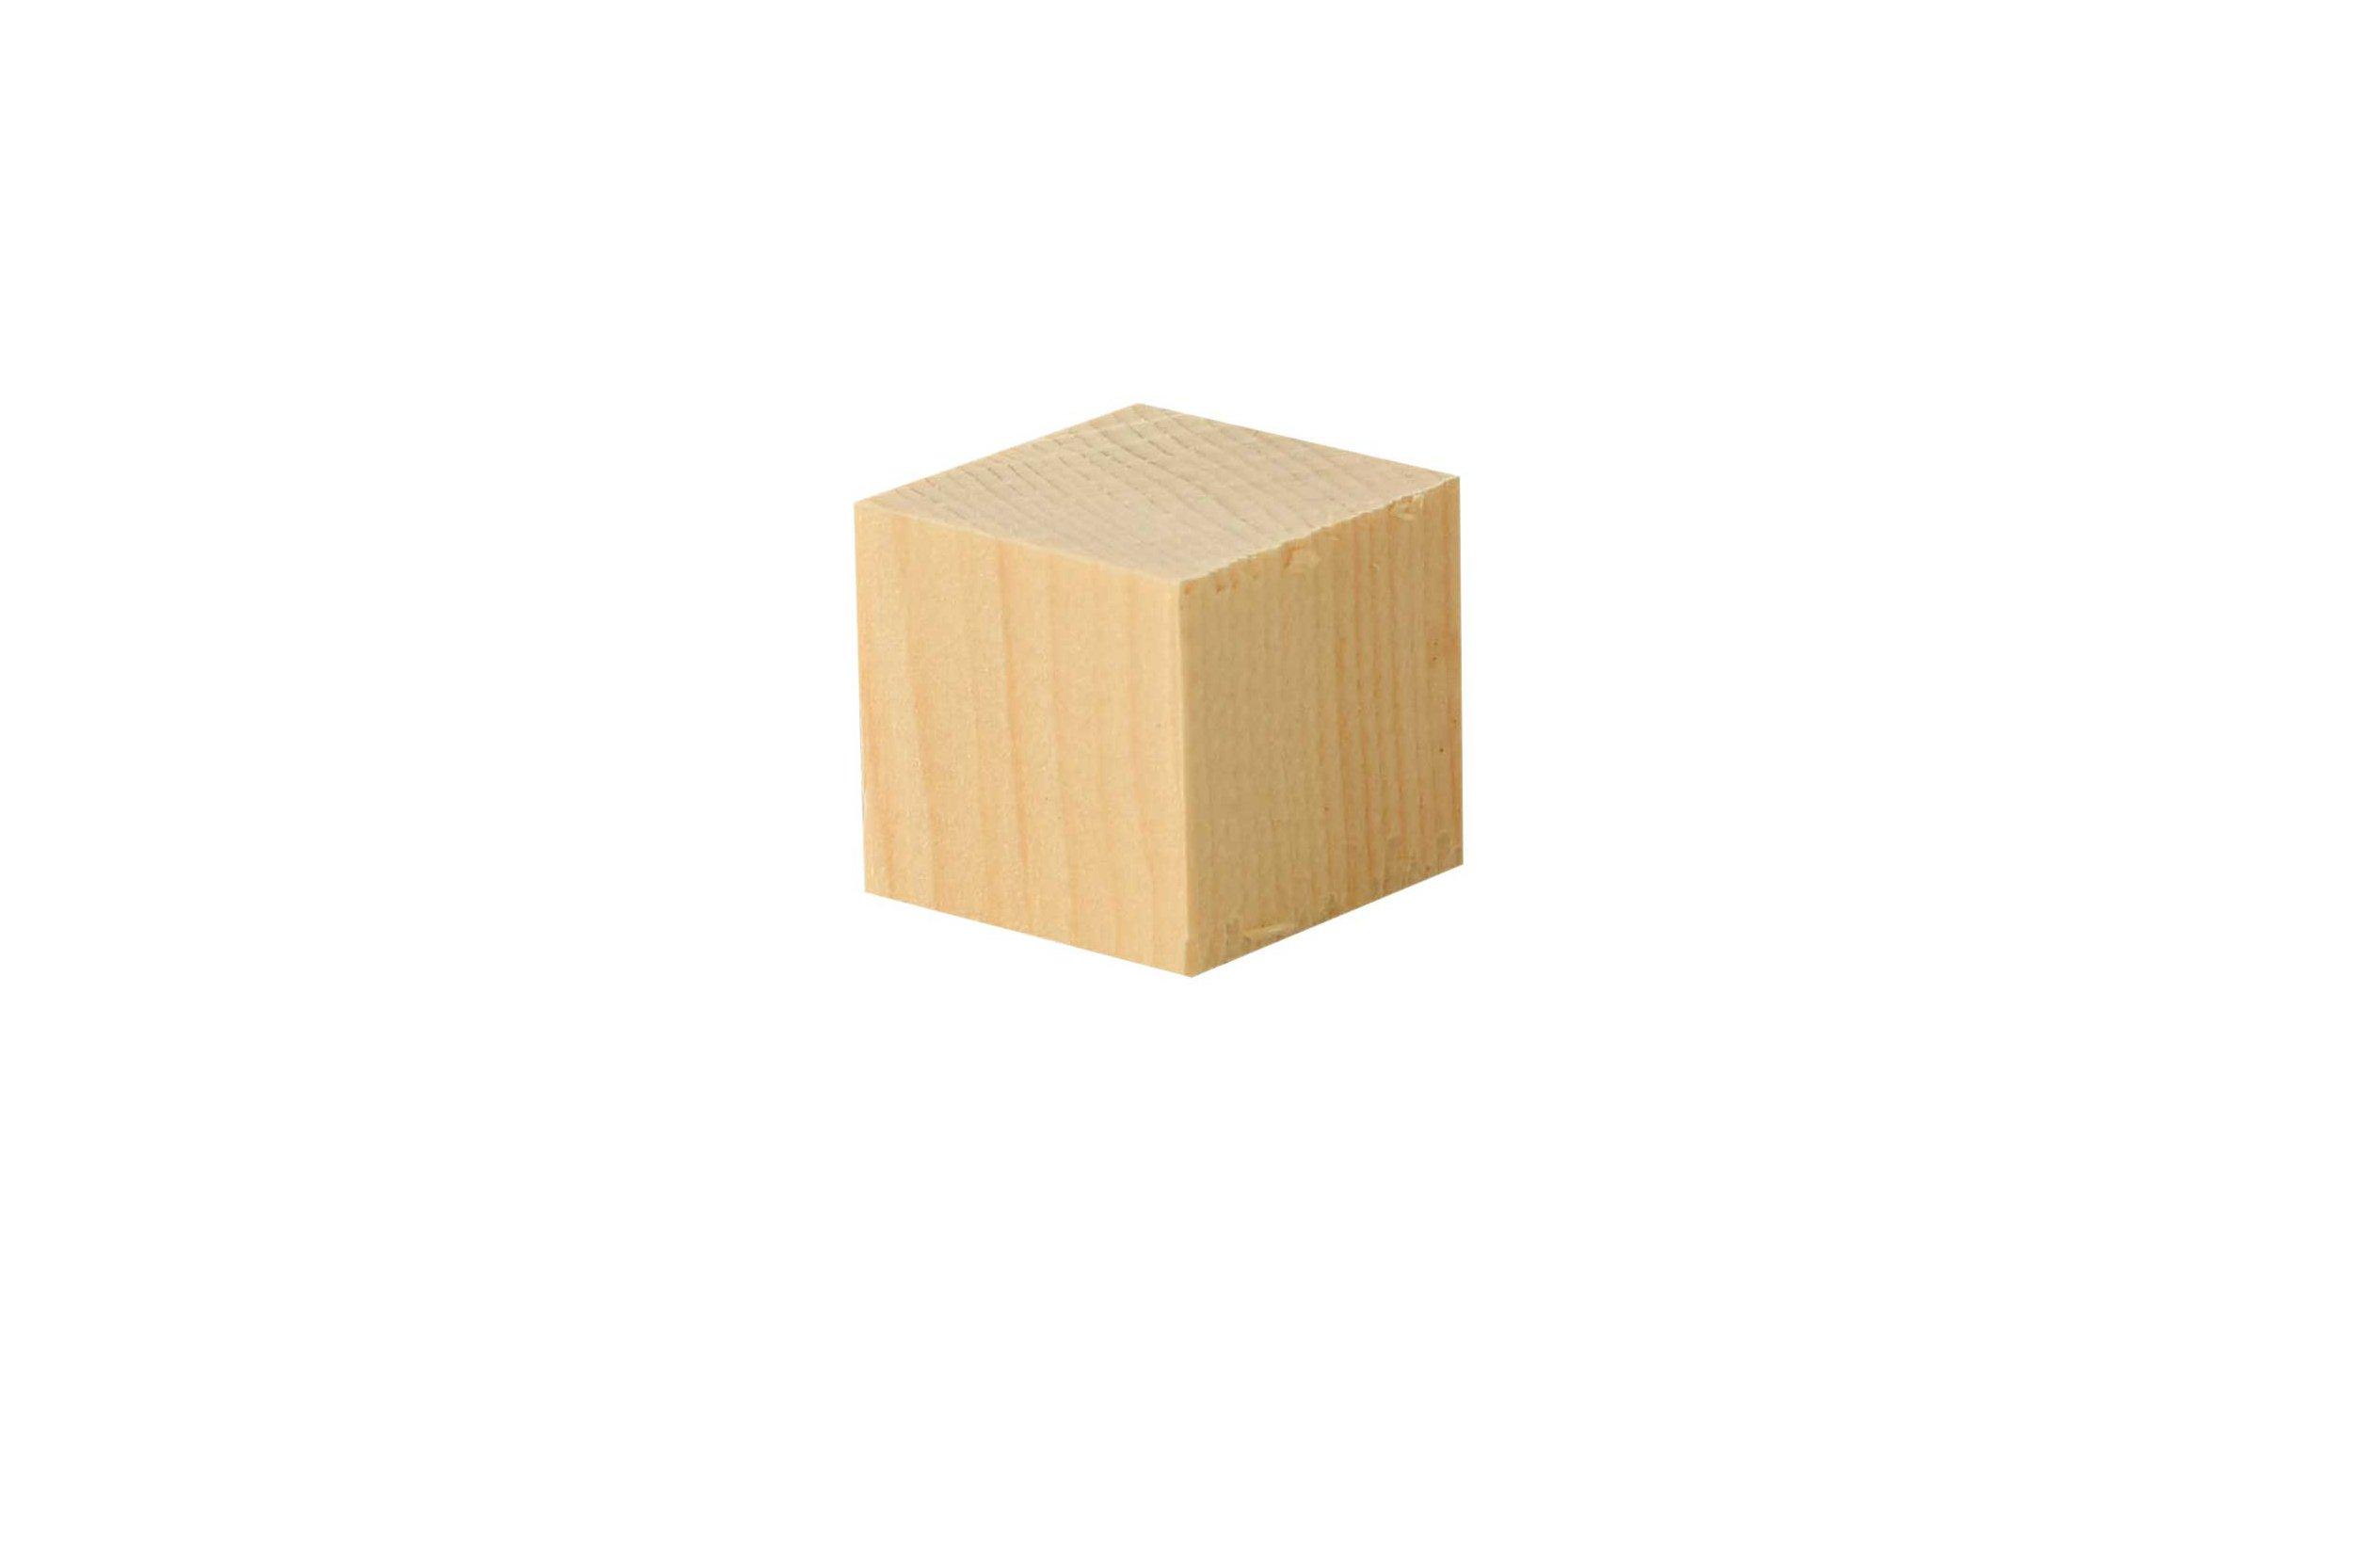 Houten blokjes alpenden, 50 st., 2x2x2 cm